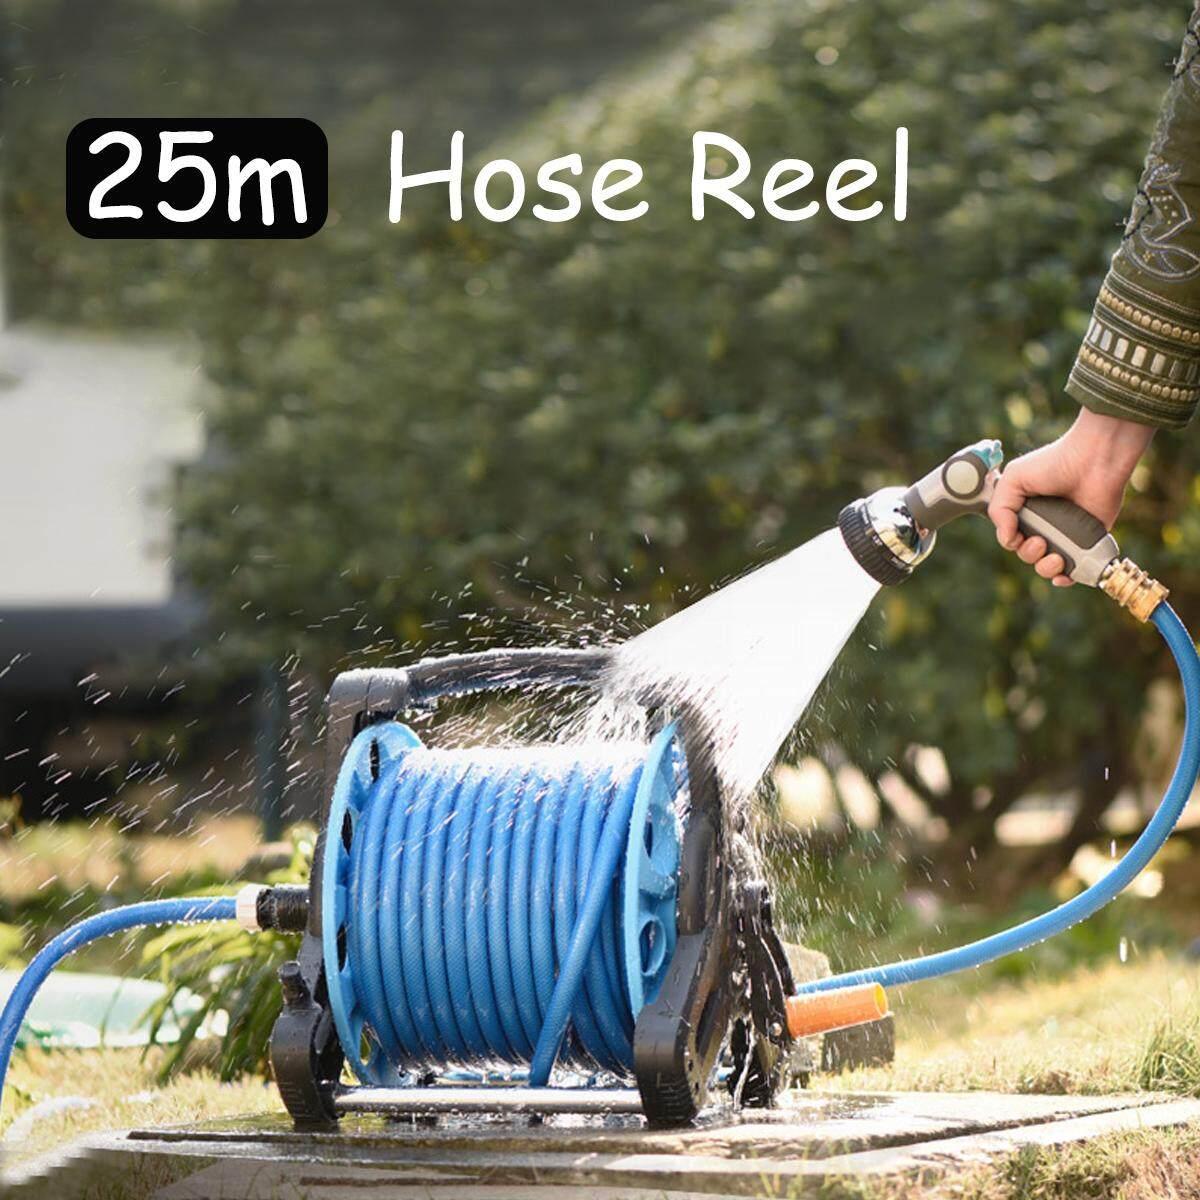 Garden Multi Purpose Wall Mount Hose Reel 25M Waterpipe Cart Storage Holder